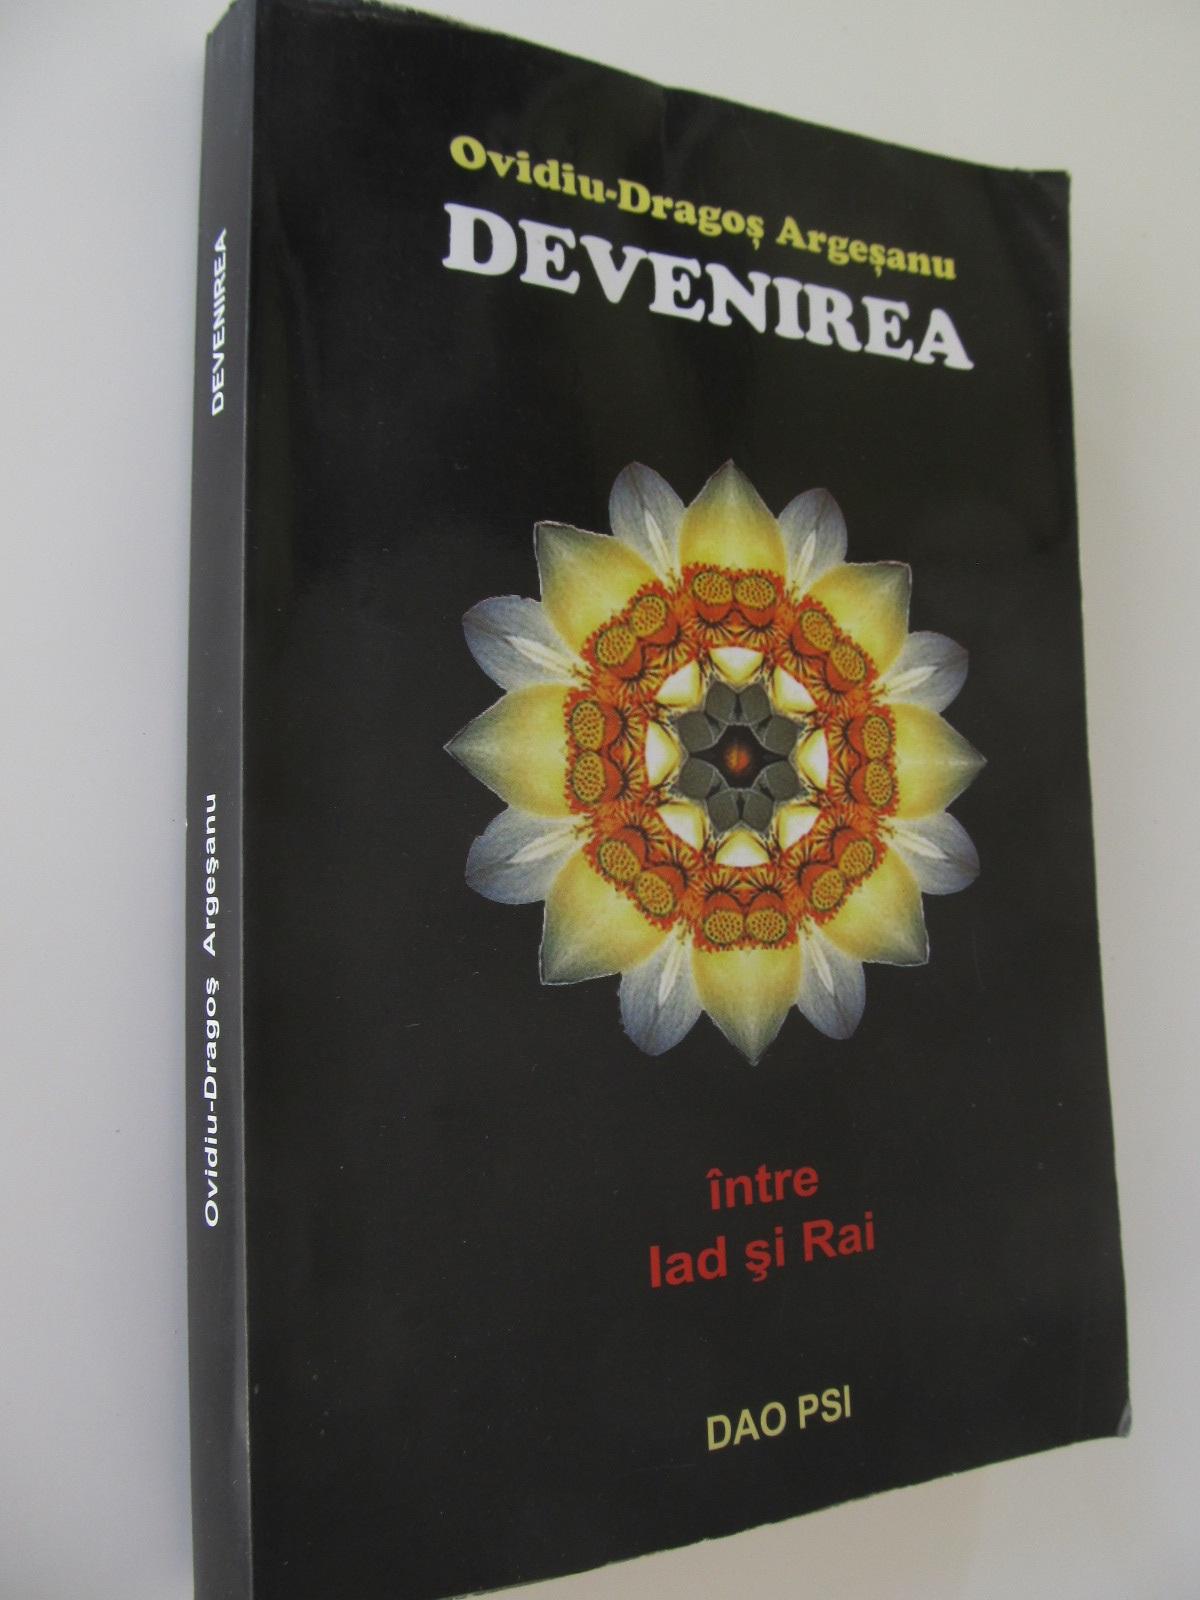 Devenirea  - Intre Iad si Rai - Ovidiu Dragos Argesanu | Detalii carte